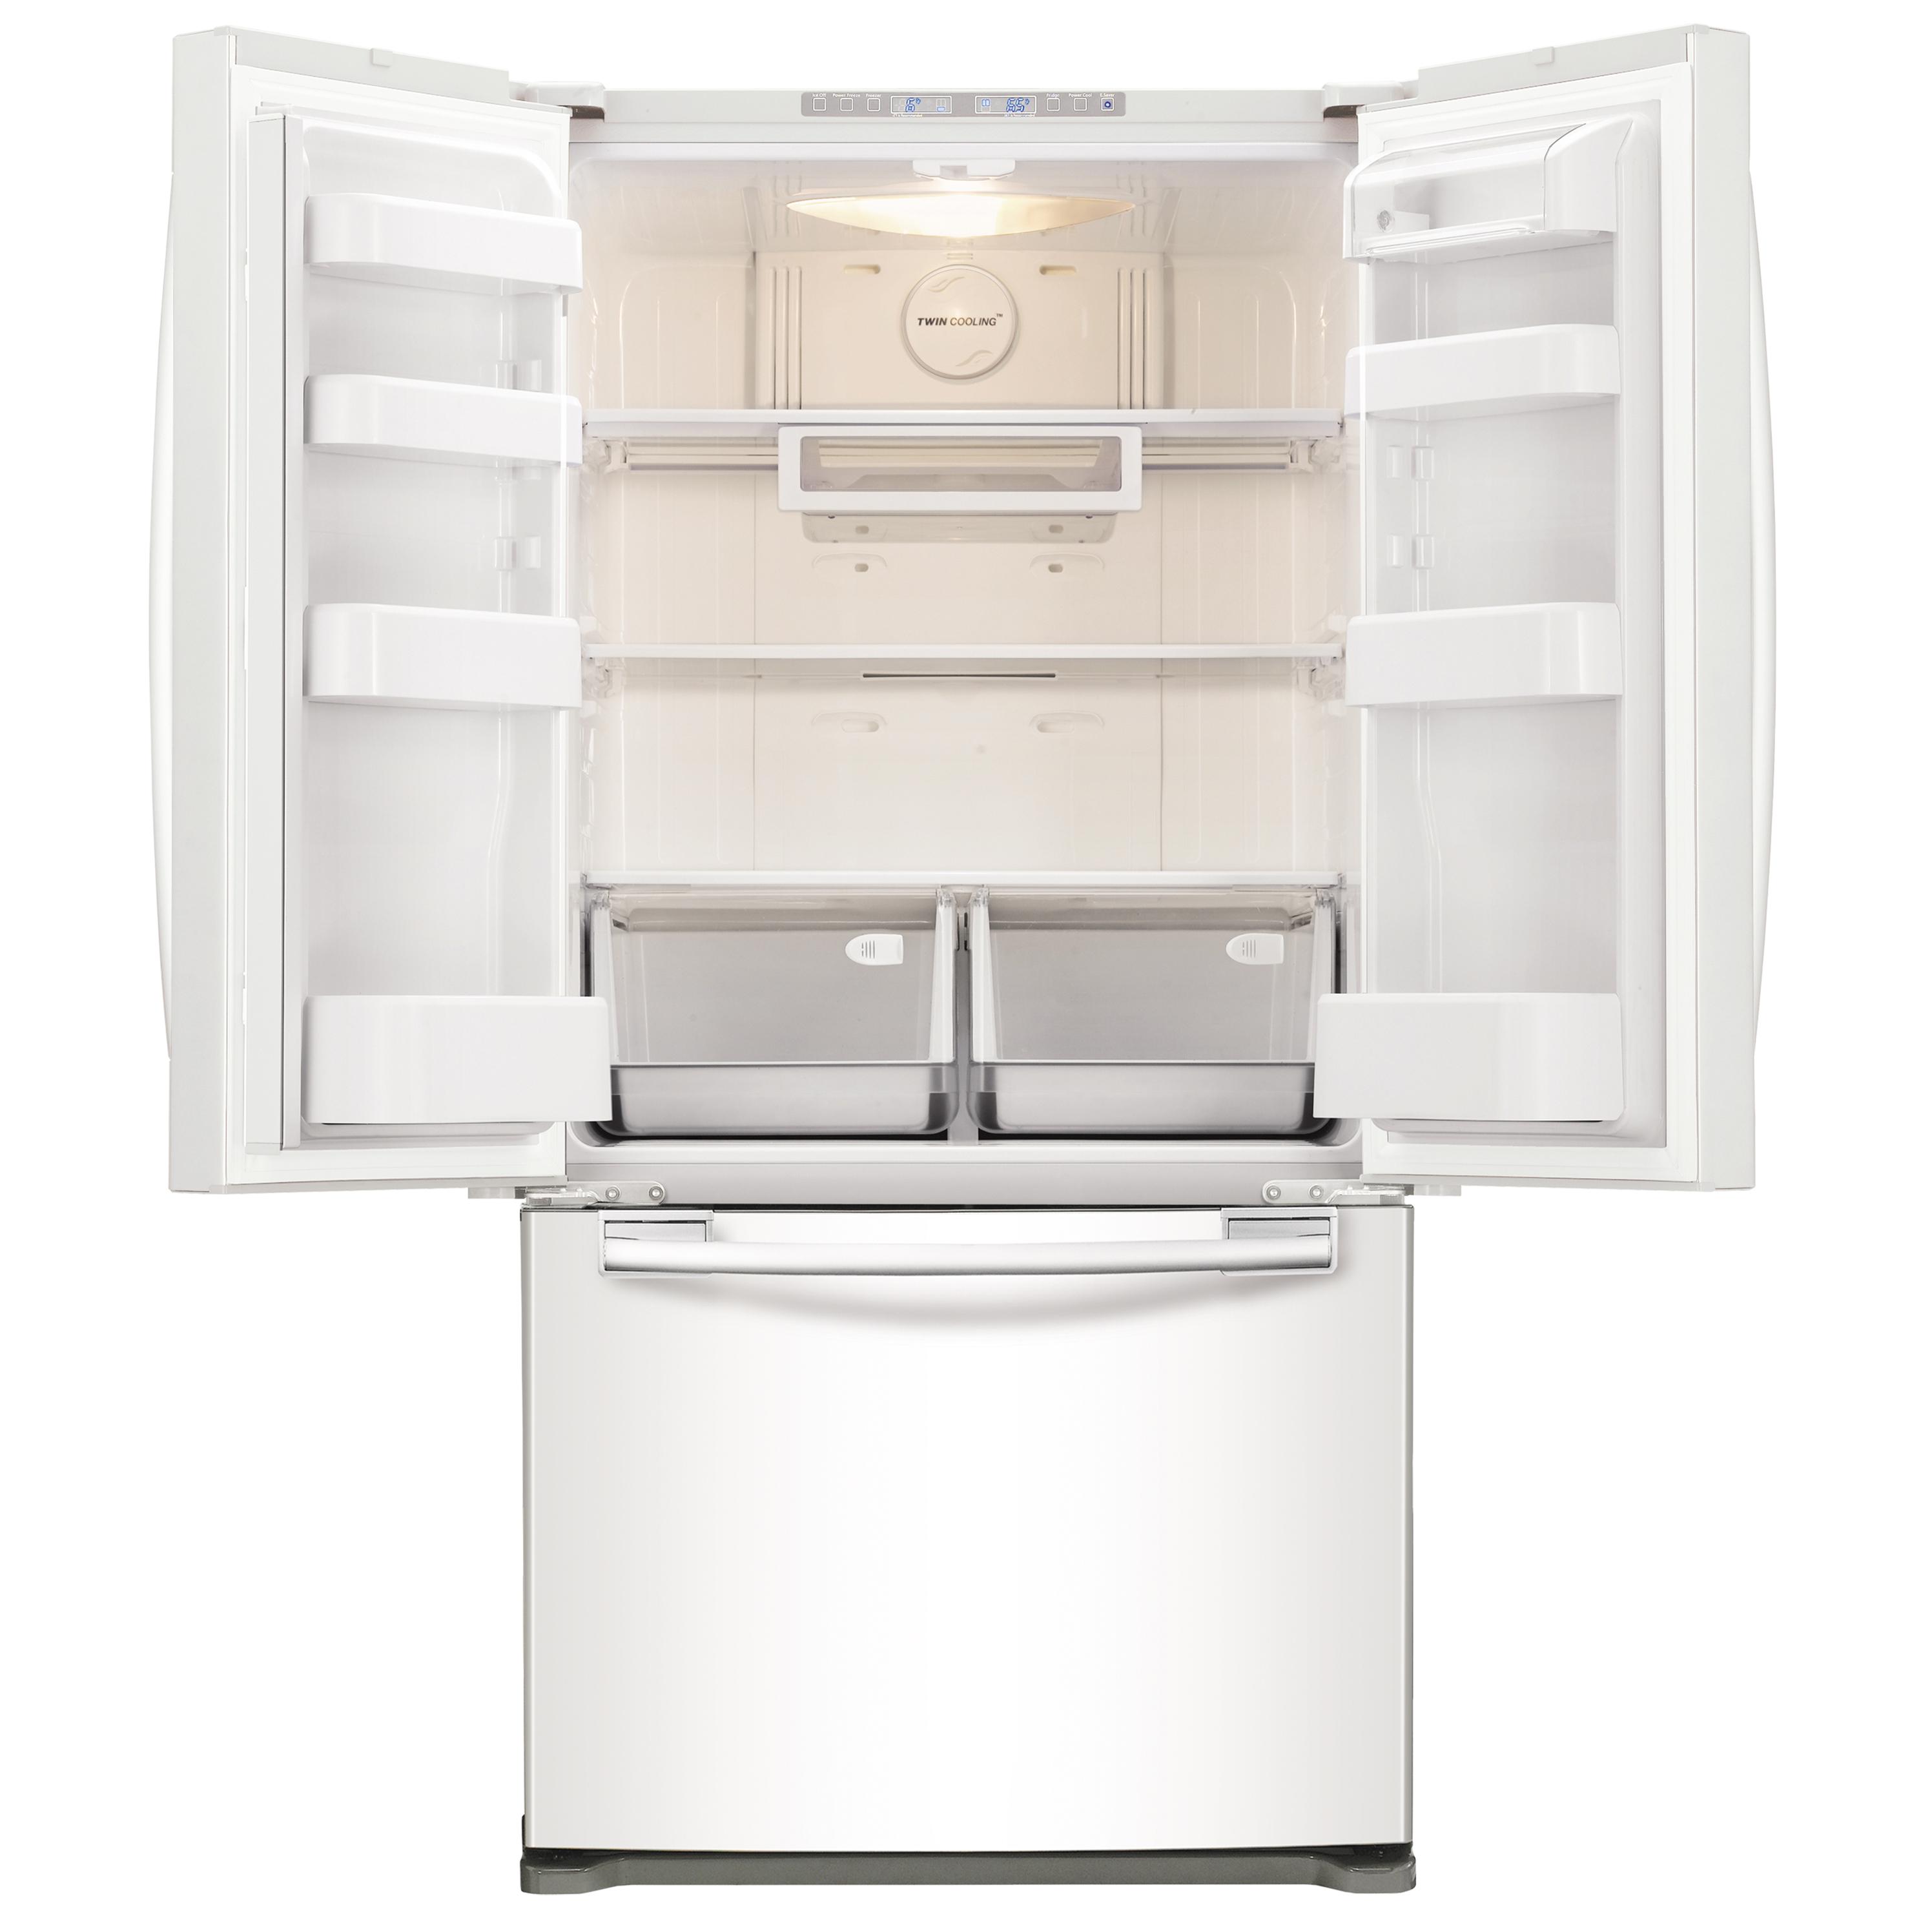 Samsung 18 cu. ft. Capacity Counter-Depth French Door Refrigerator - White